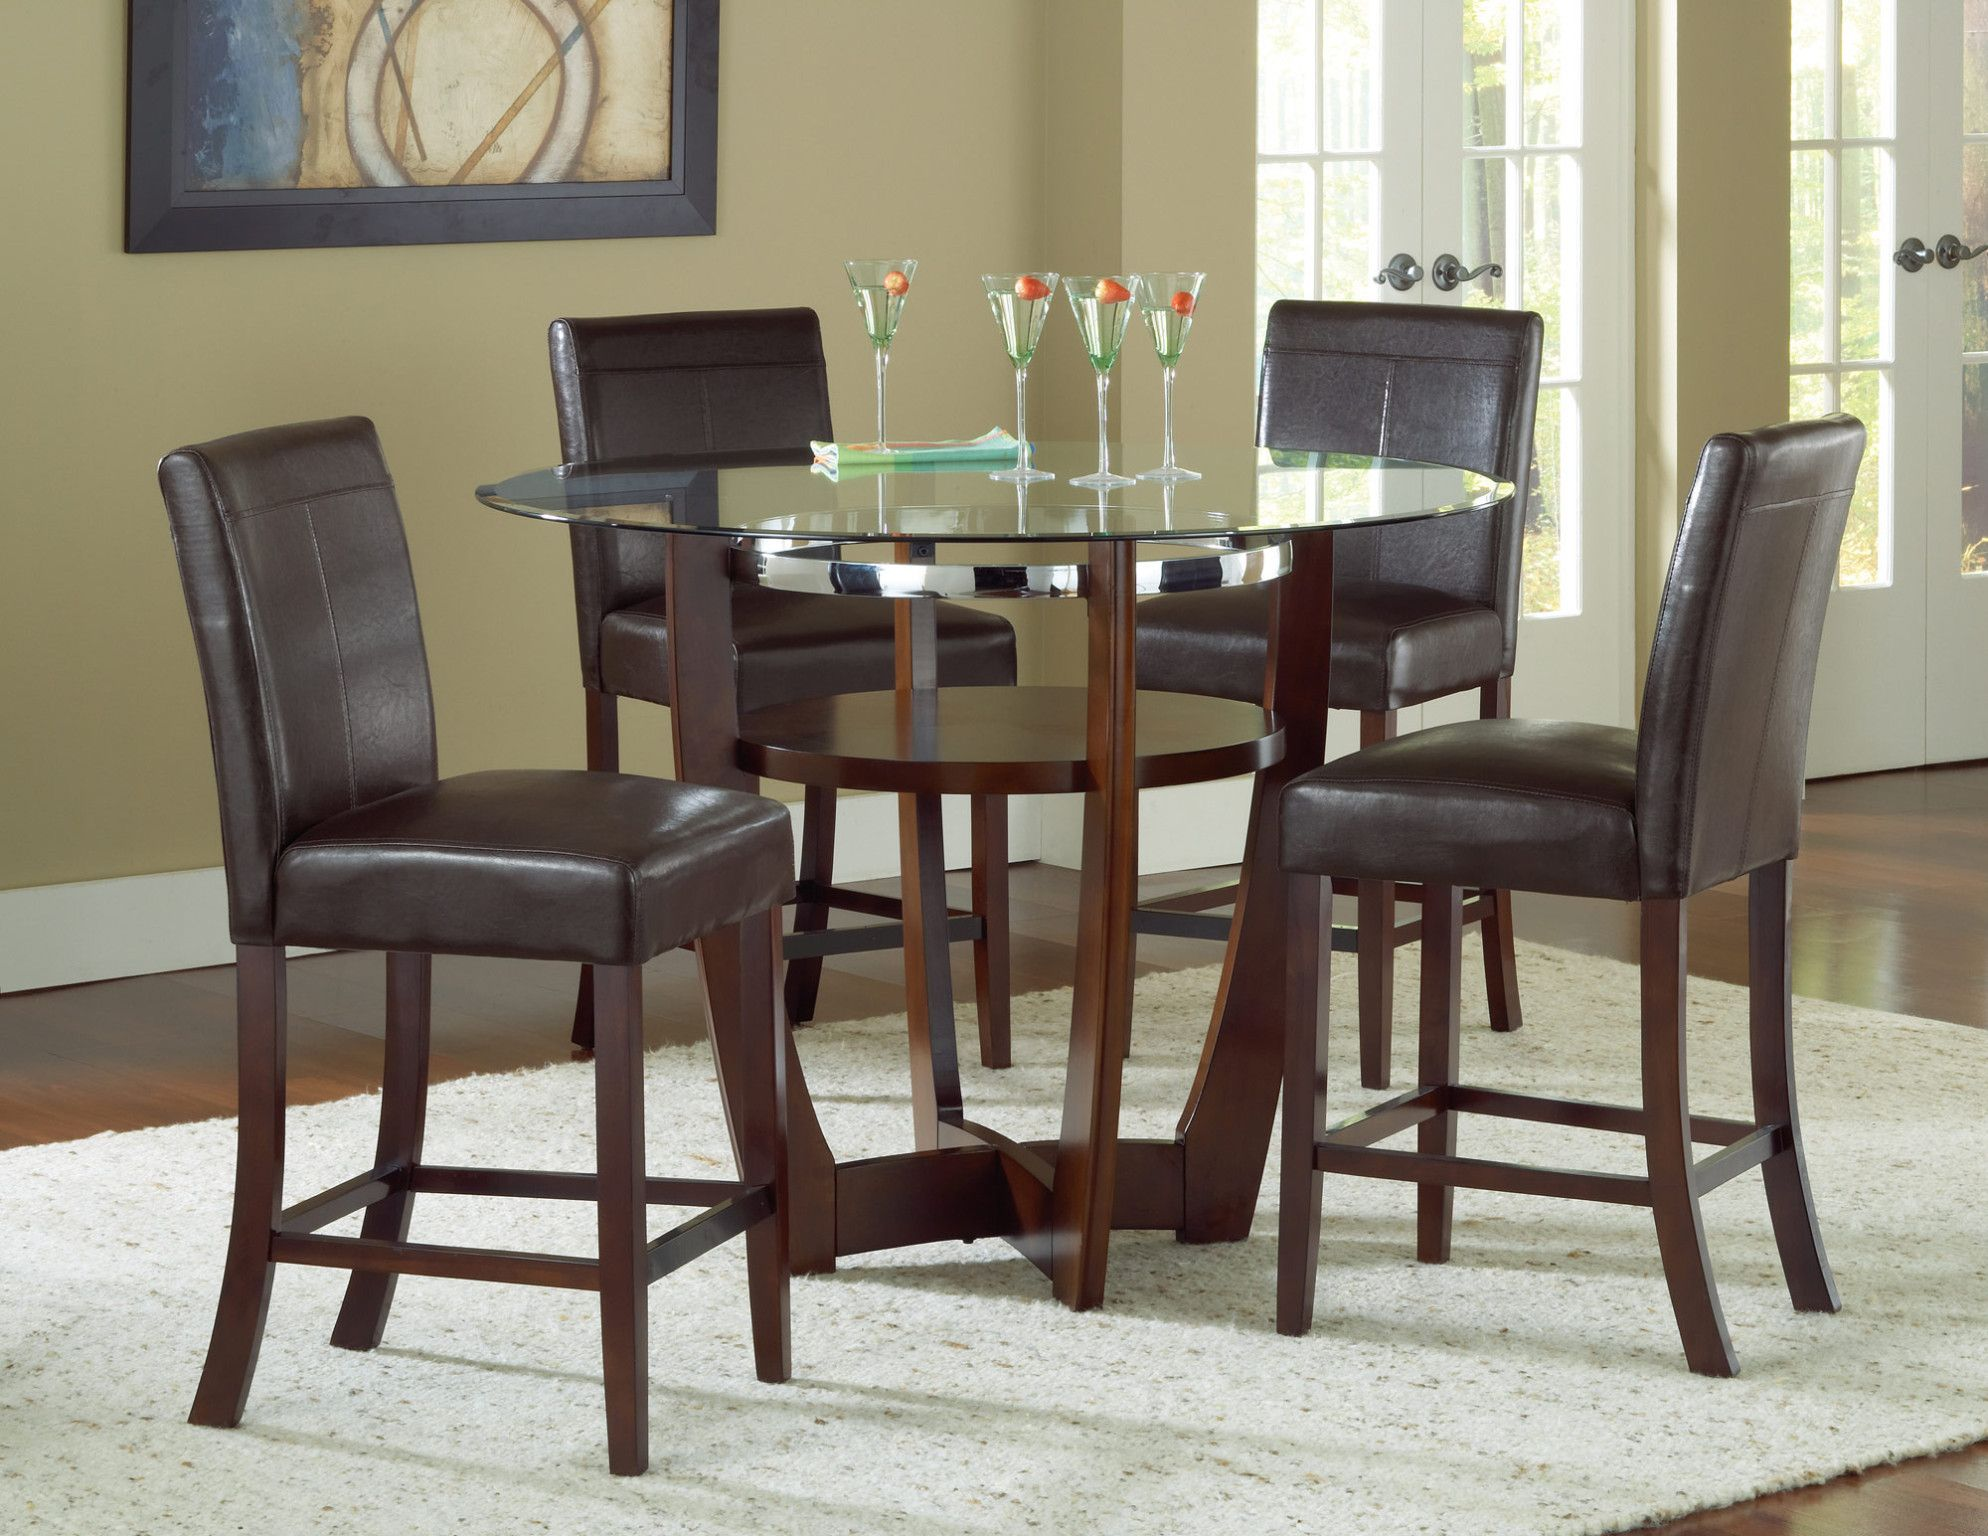 Dining Table Design Basics 101 Dining Table Design Design